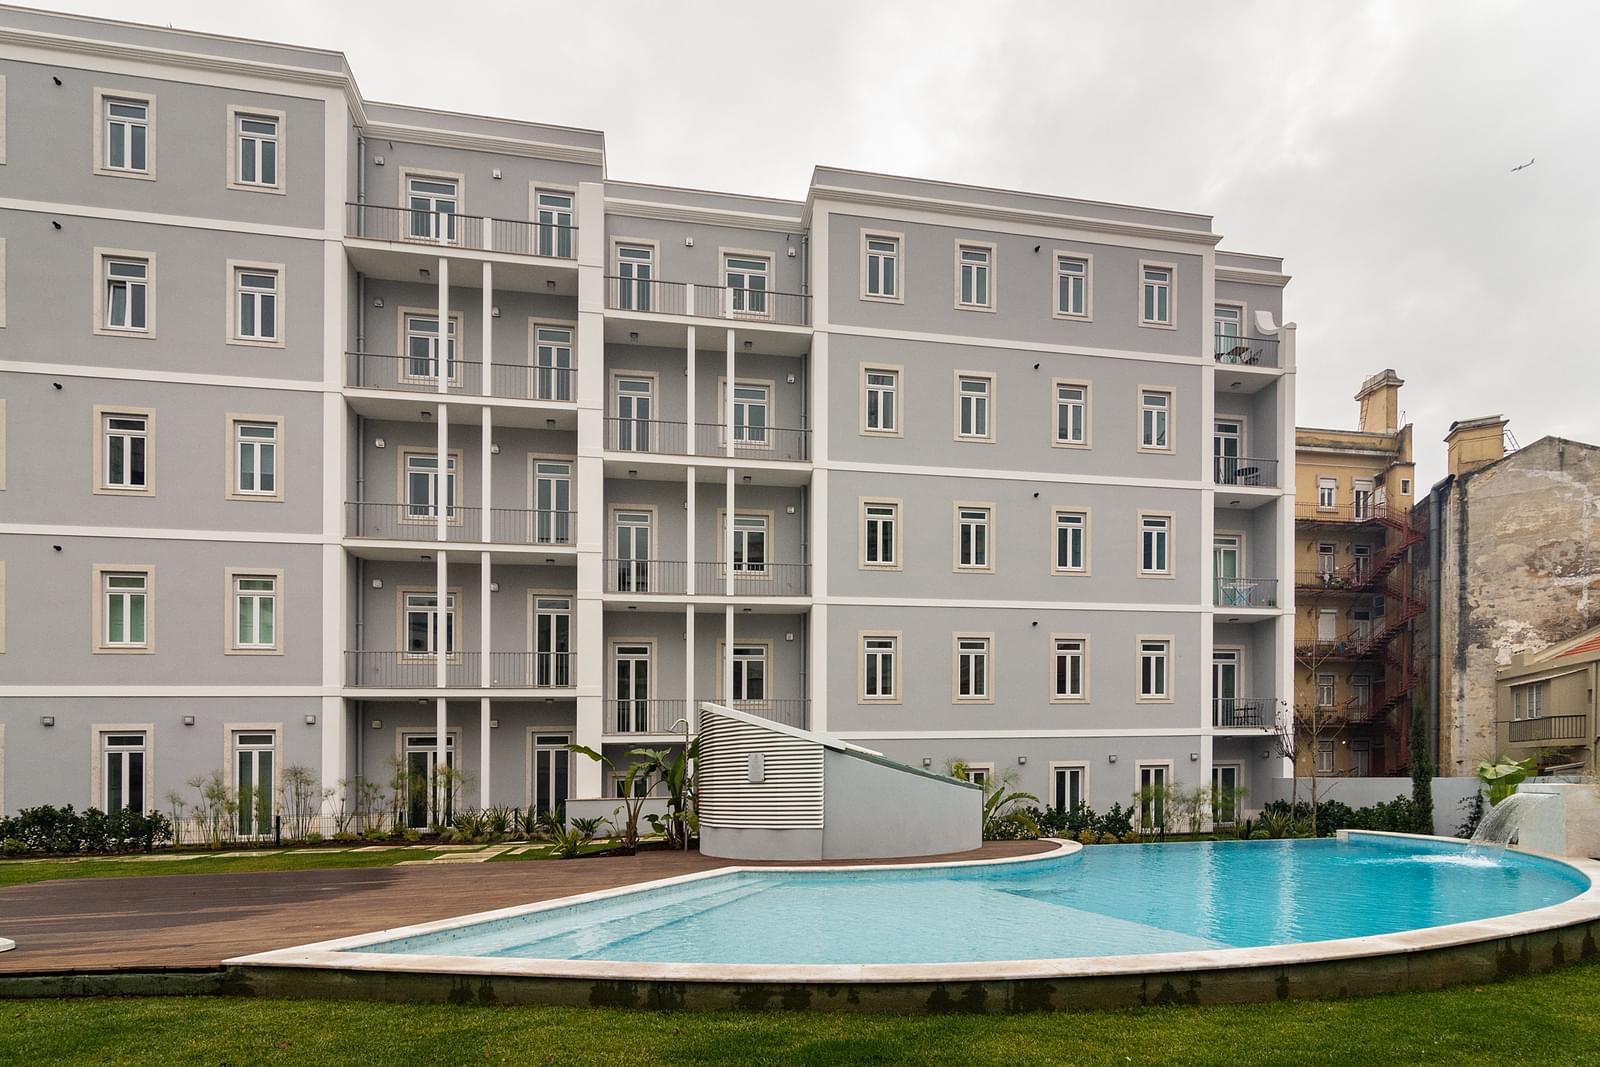 pf19003-apartamento-t2-lisboa-1cdcdac8-7435-4089-bd97-1848ccd385f7